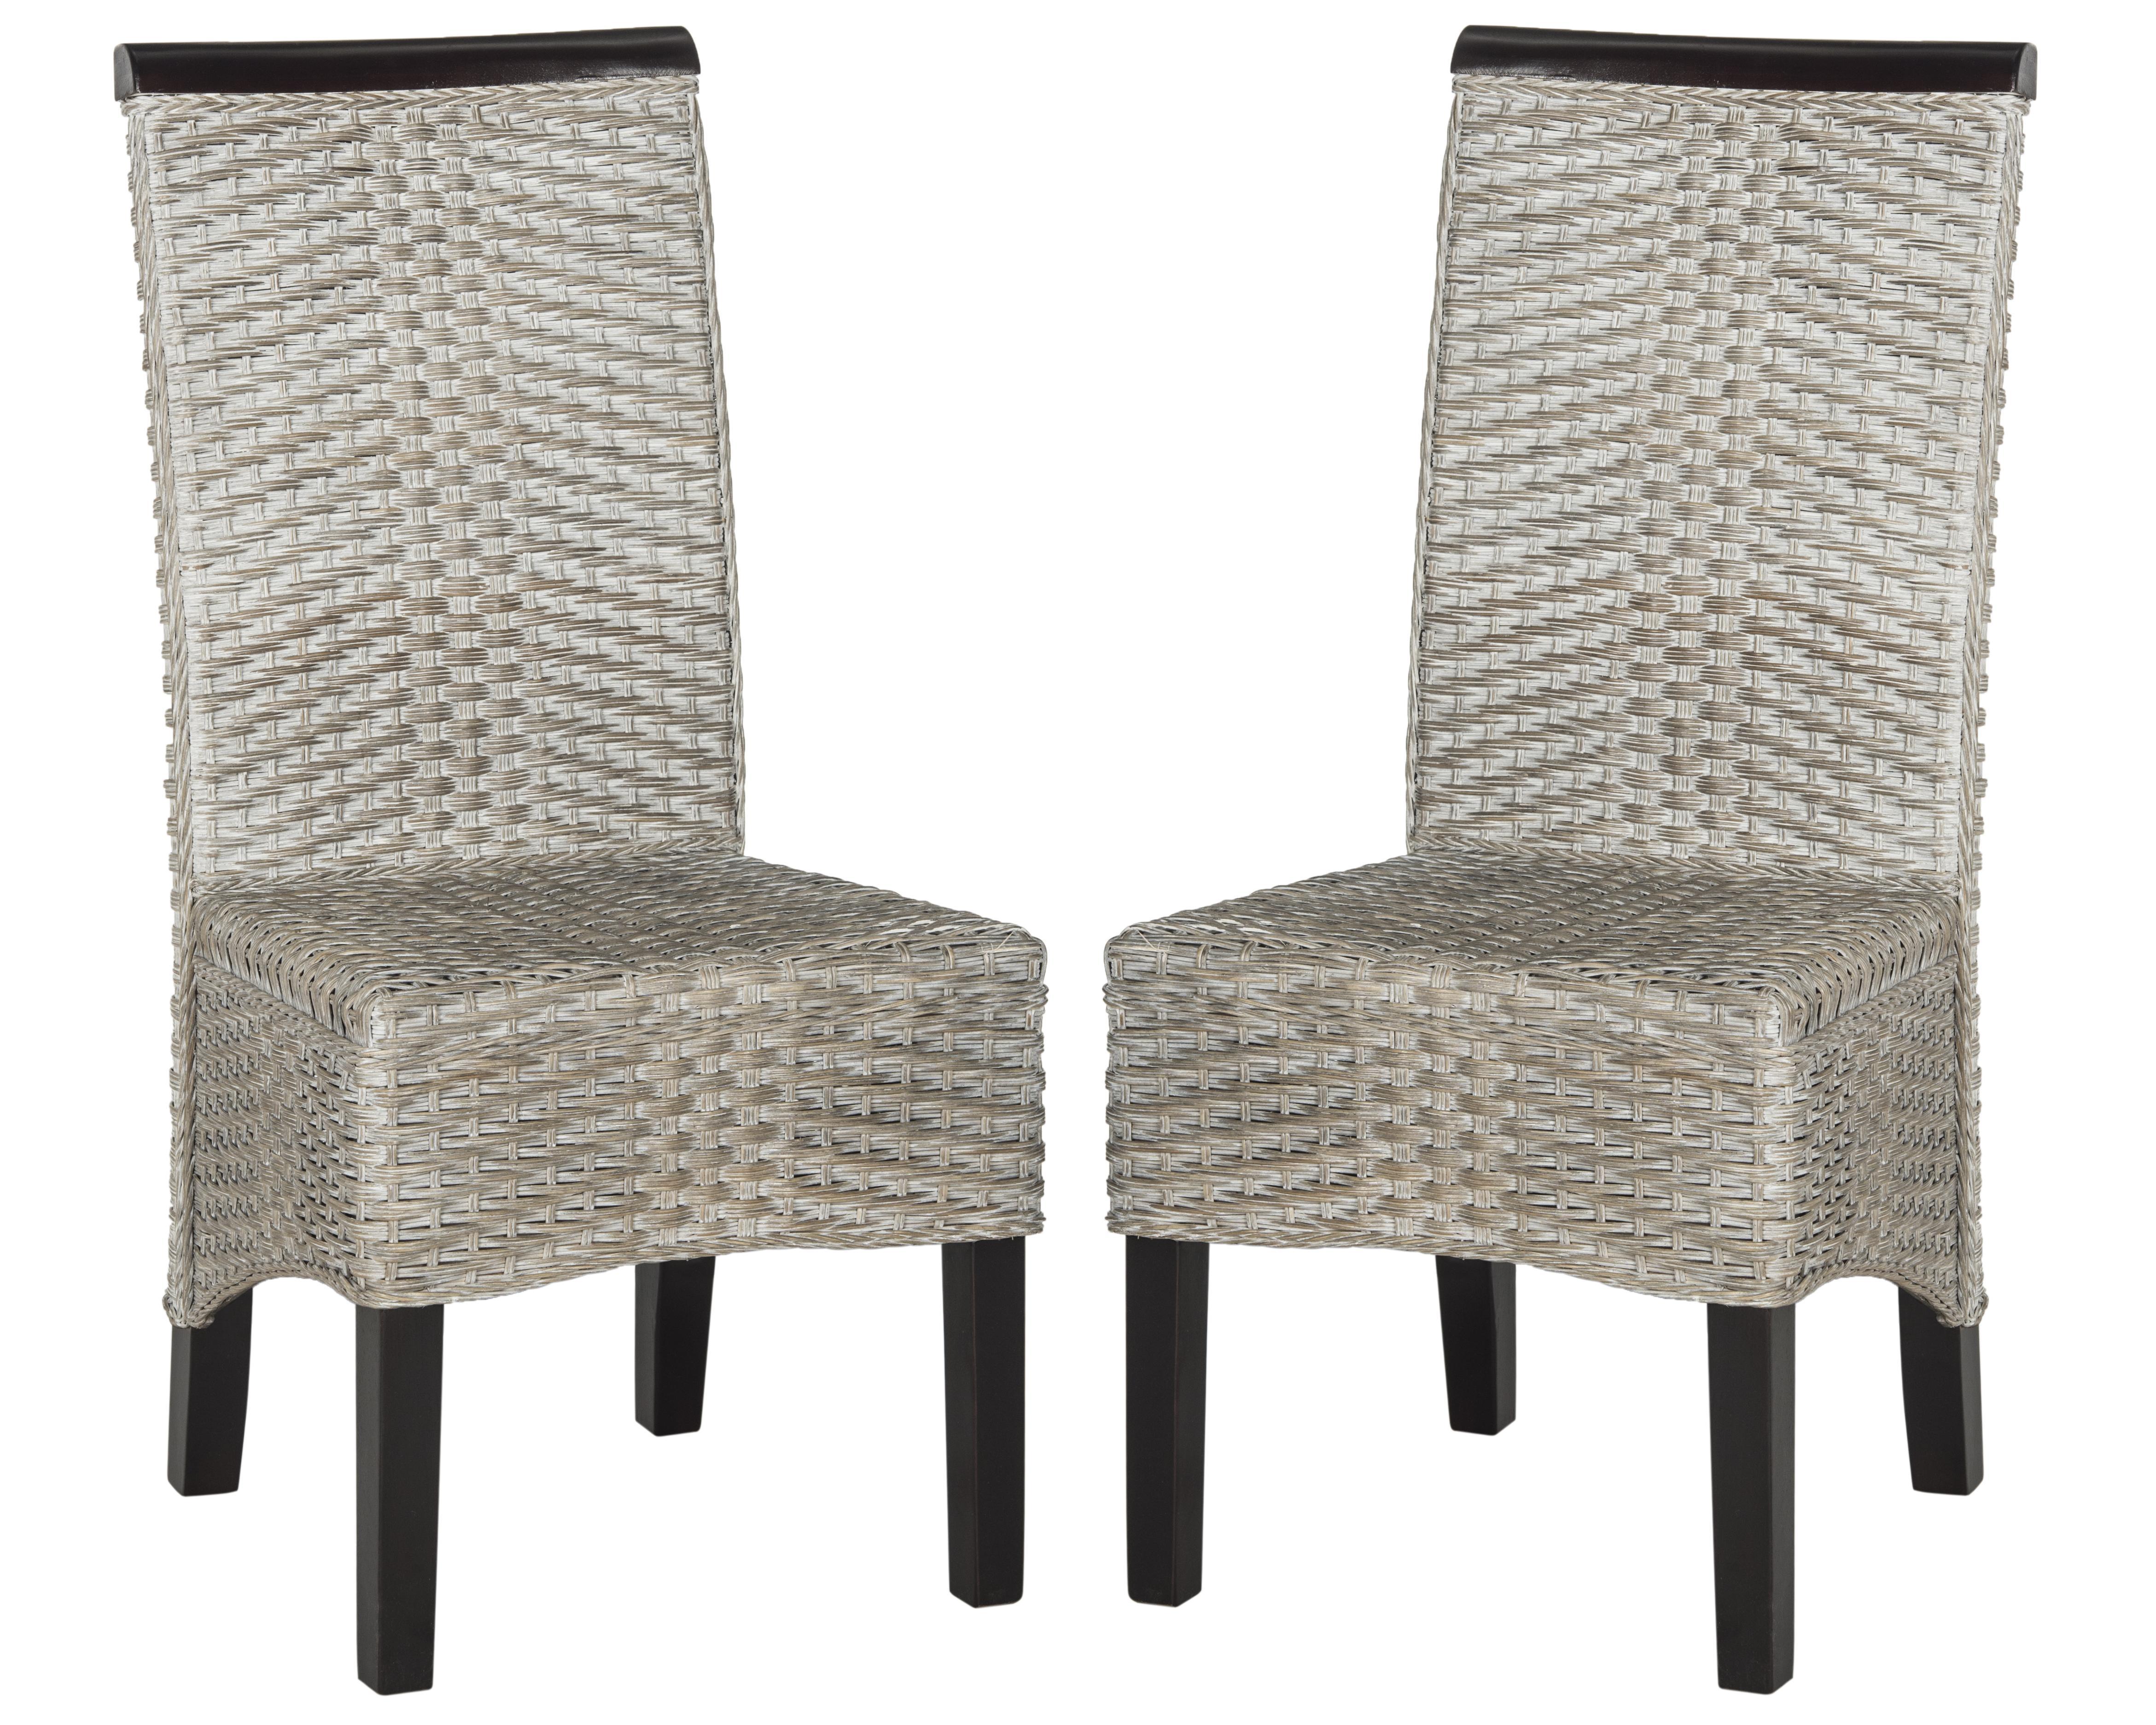 Safavieh Ilya Wicker Dining Chair